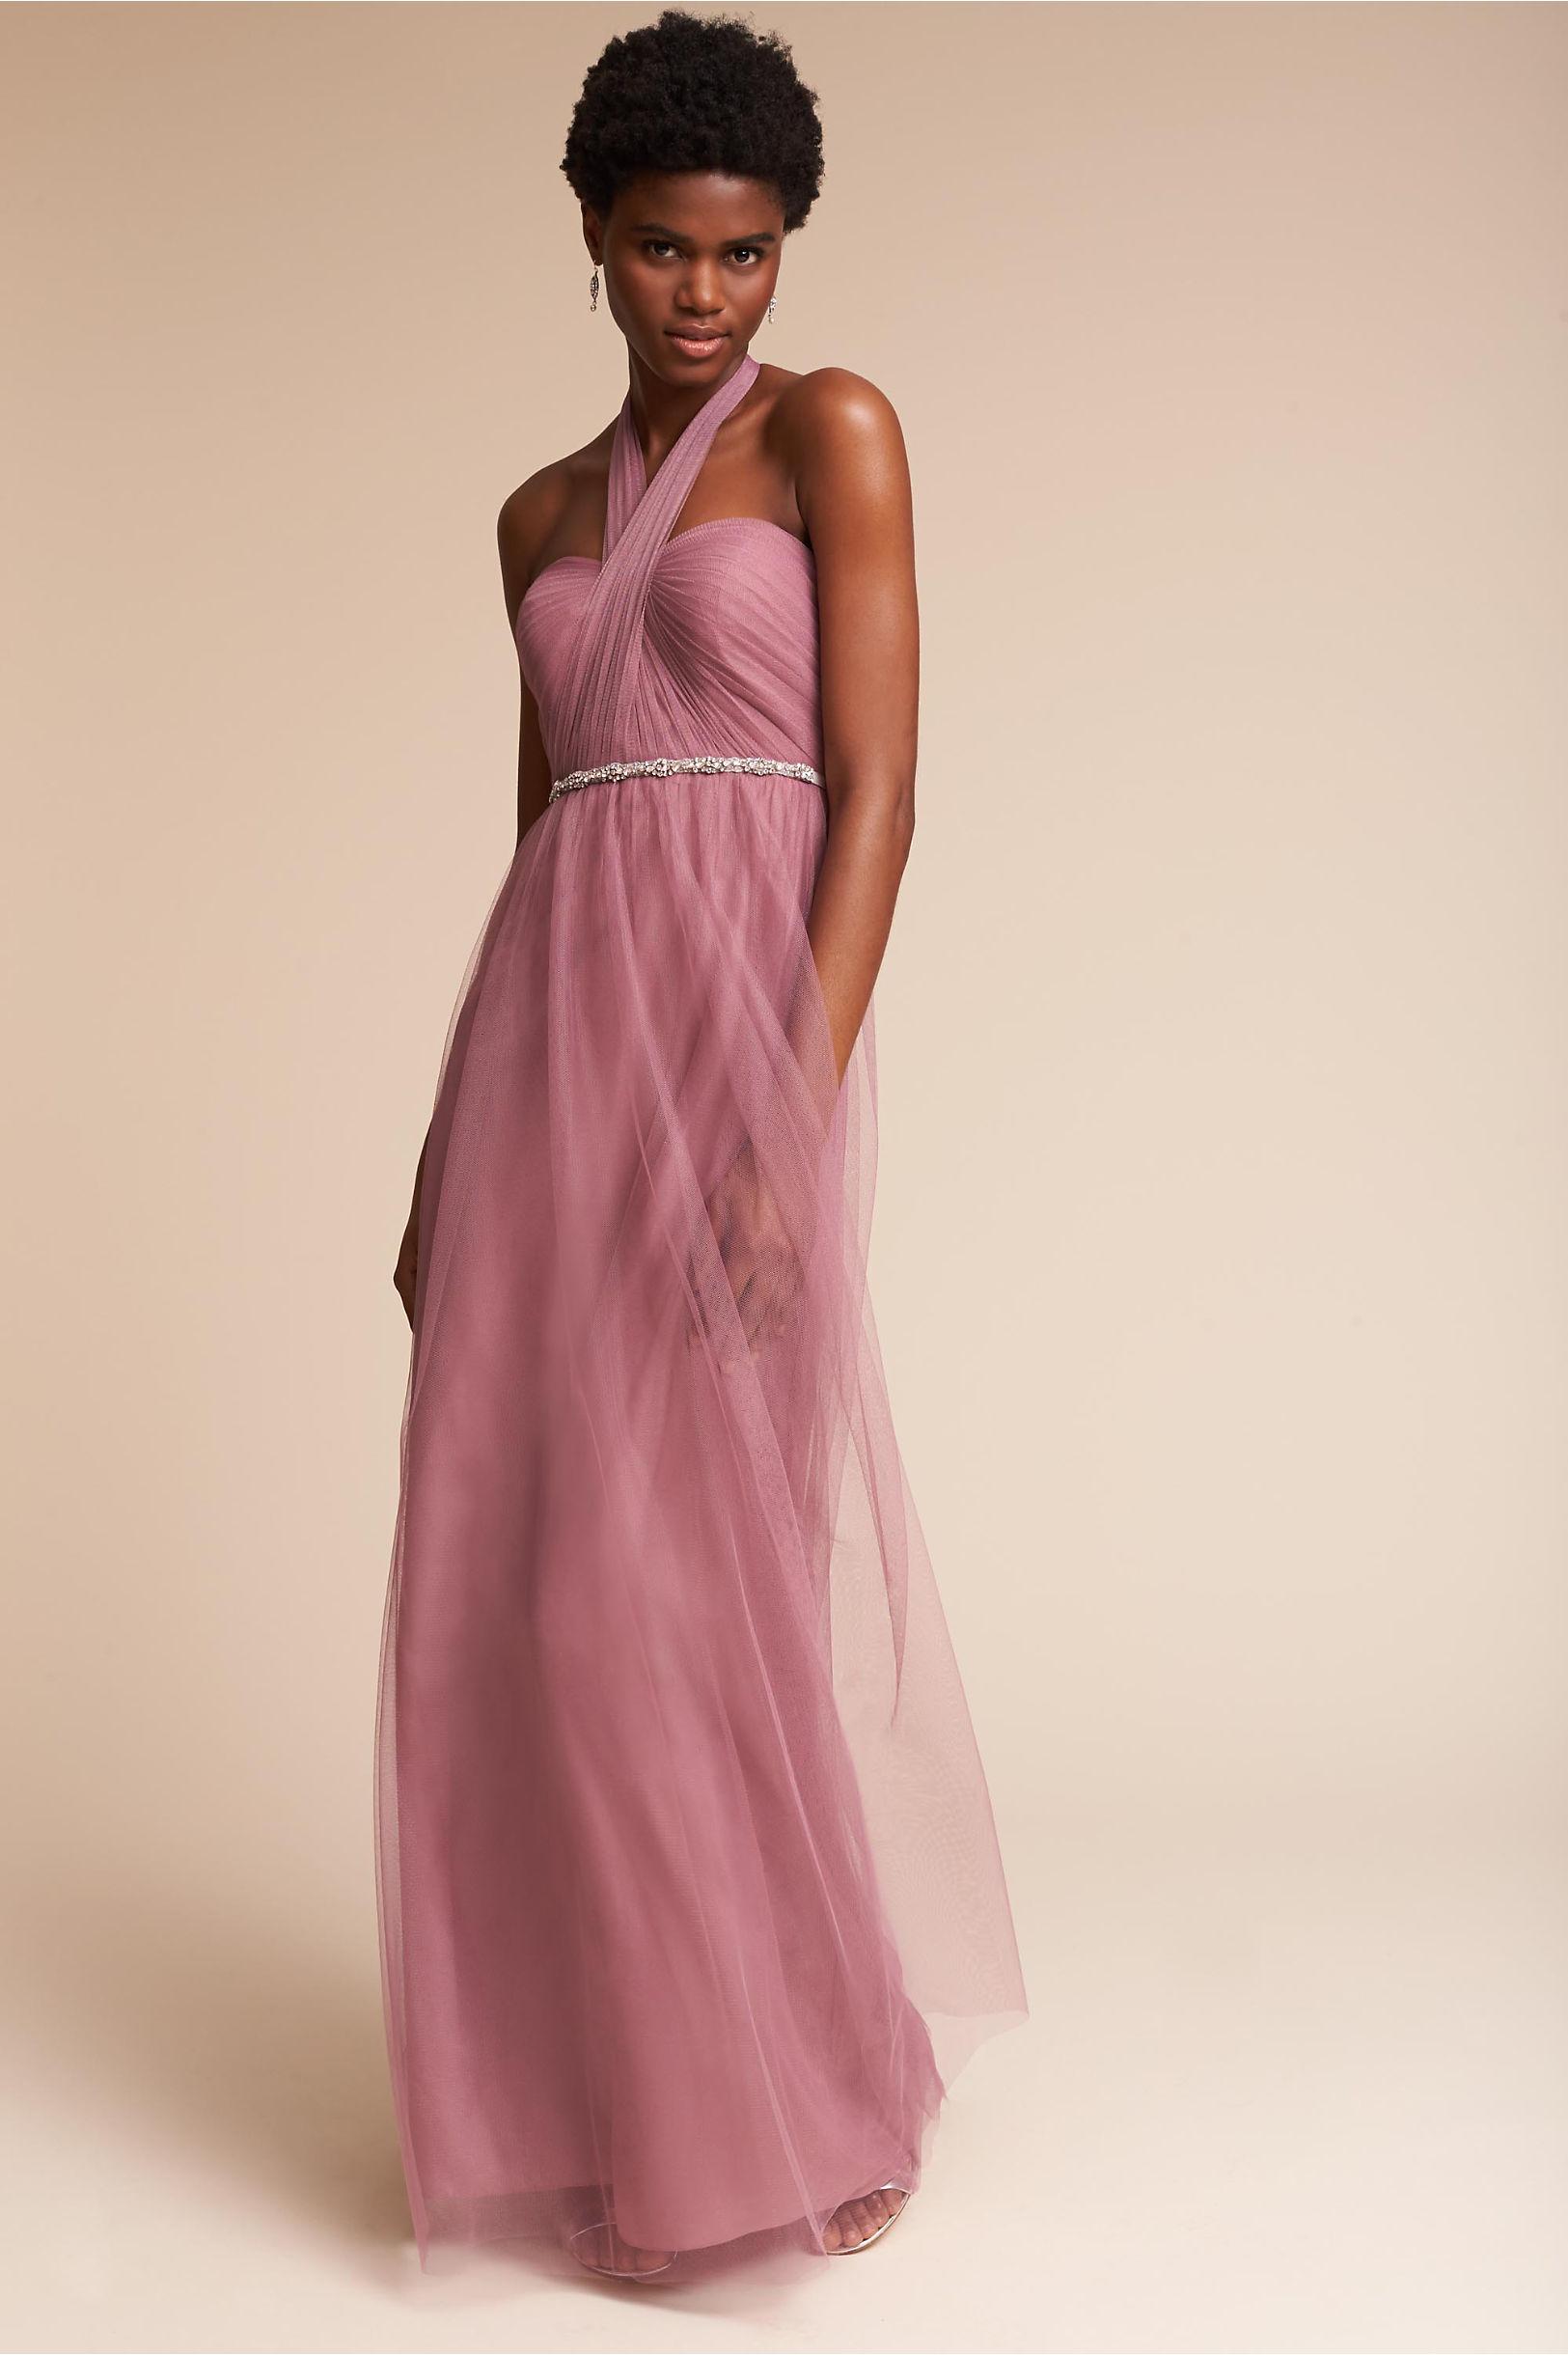 Annabelle Dress Cherry Blossom in Sale | BHLDN